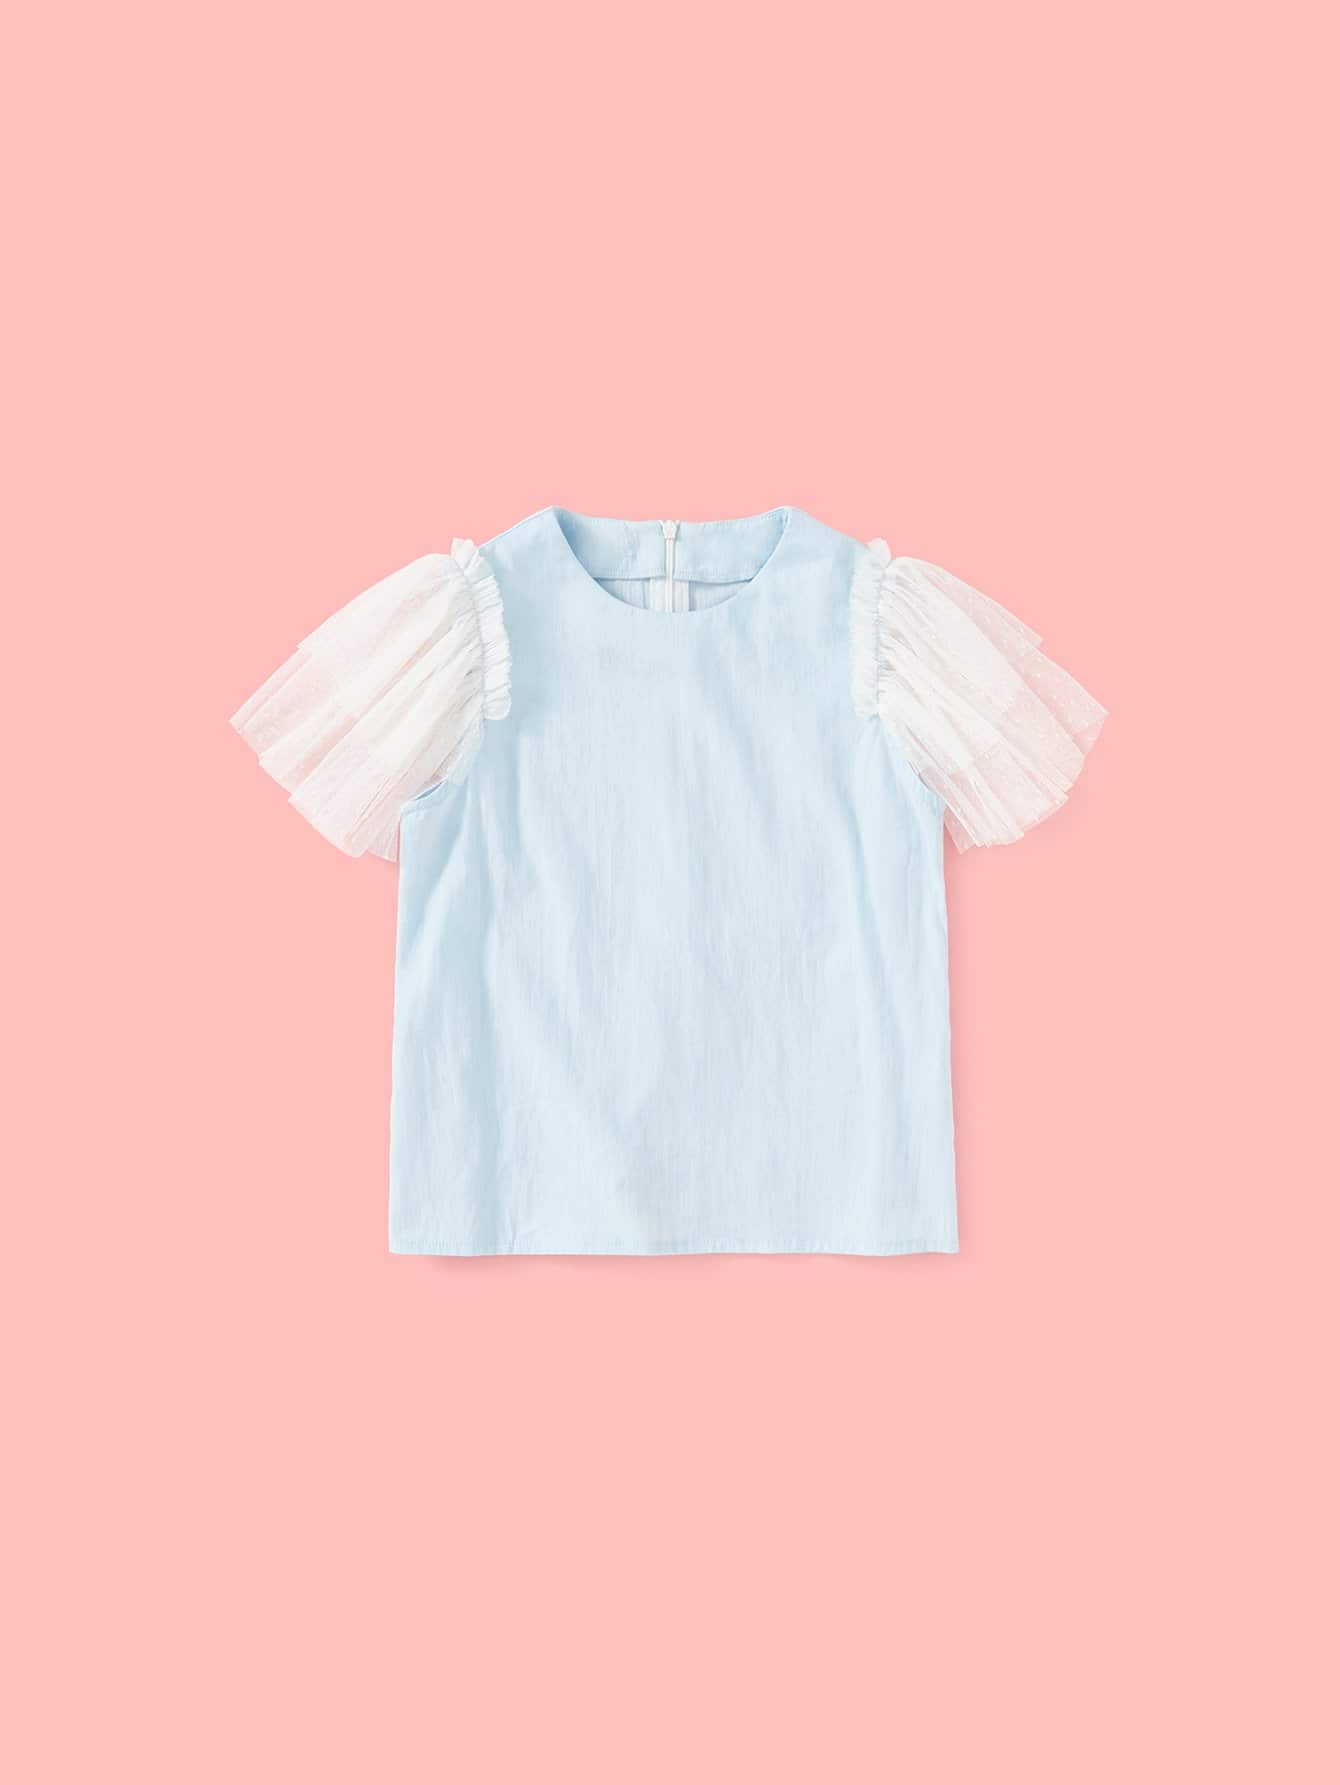 Layered Flounce Mesh Sleeve Zip Back Top mesh contrast flounce sleeve top